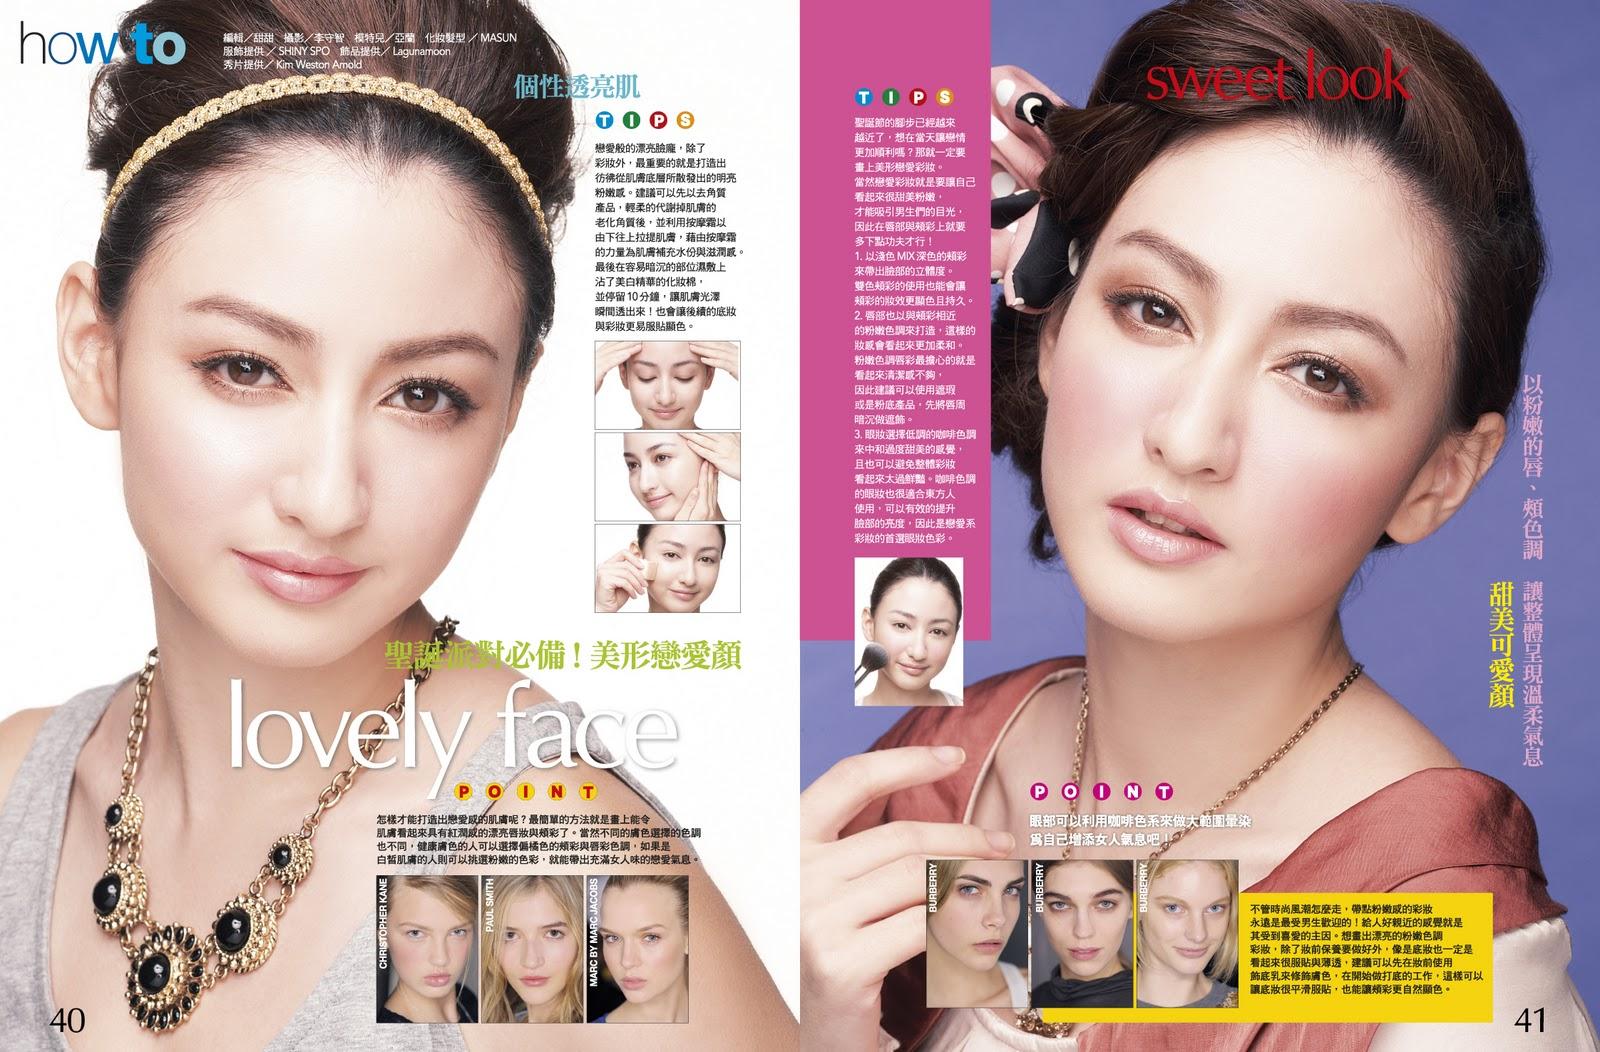 Style W屈臣氏美妝誌: Style W 2011.12月號精彩內容